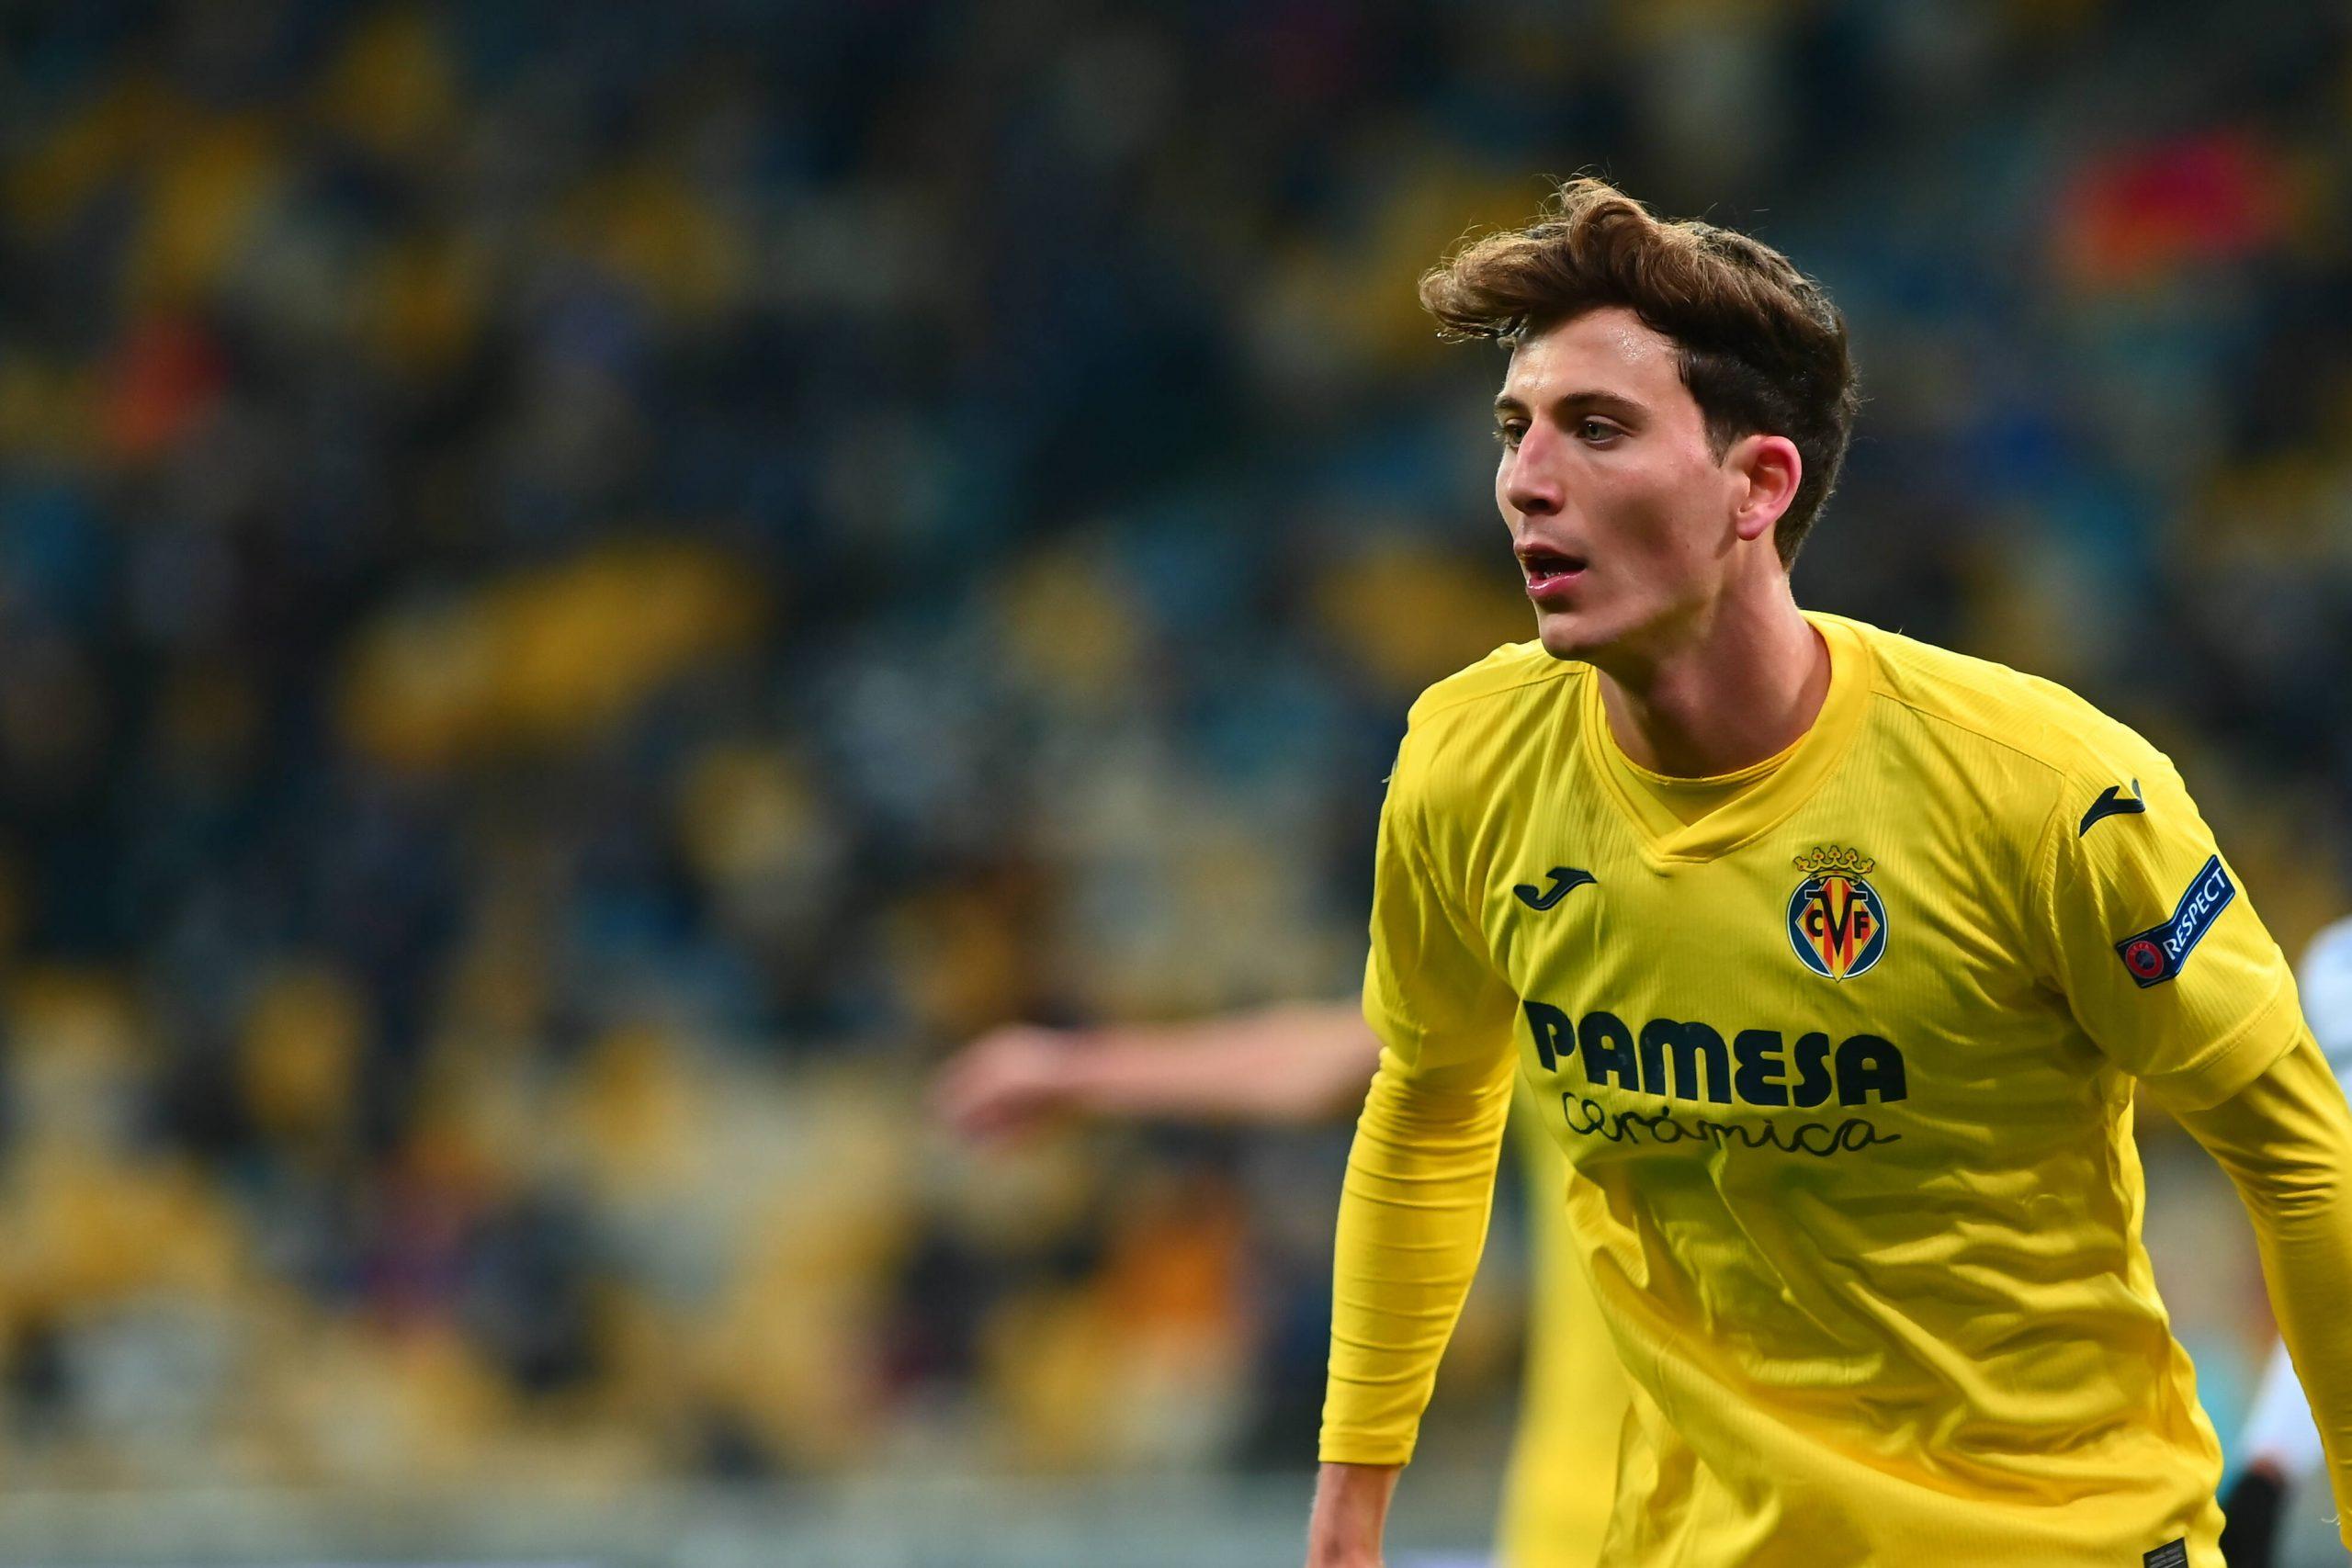 Transfer News: Villarreal star Pau Torres keen on Manchester United move